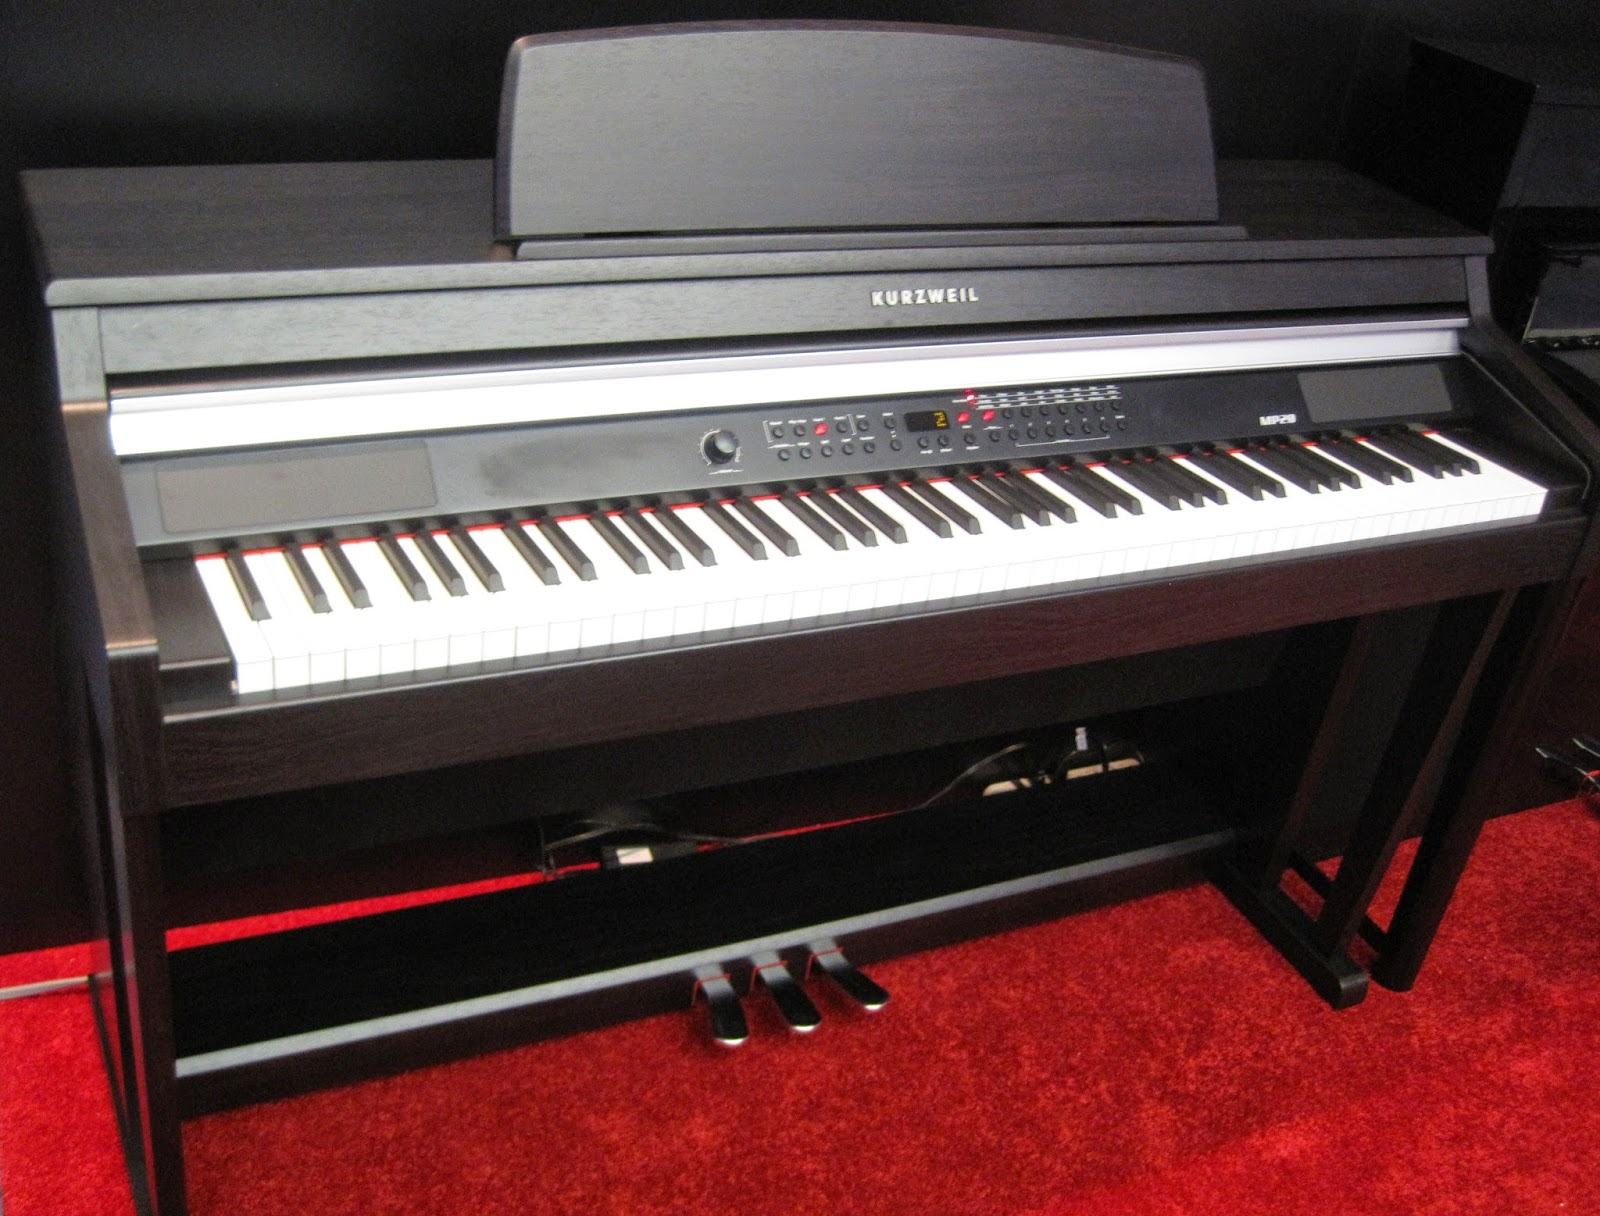 az piano reviews piano pedals in digital acoustic pianos. Black Bedroom Furniture Sets. Home Design Ideas